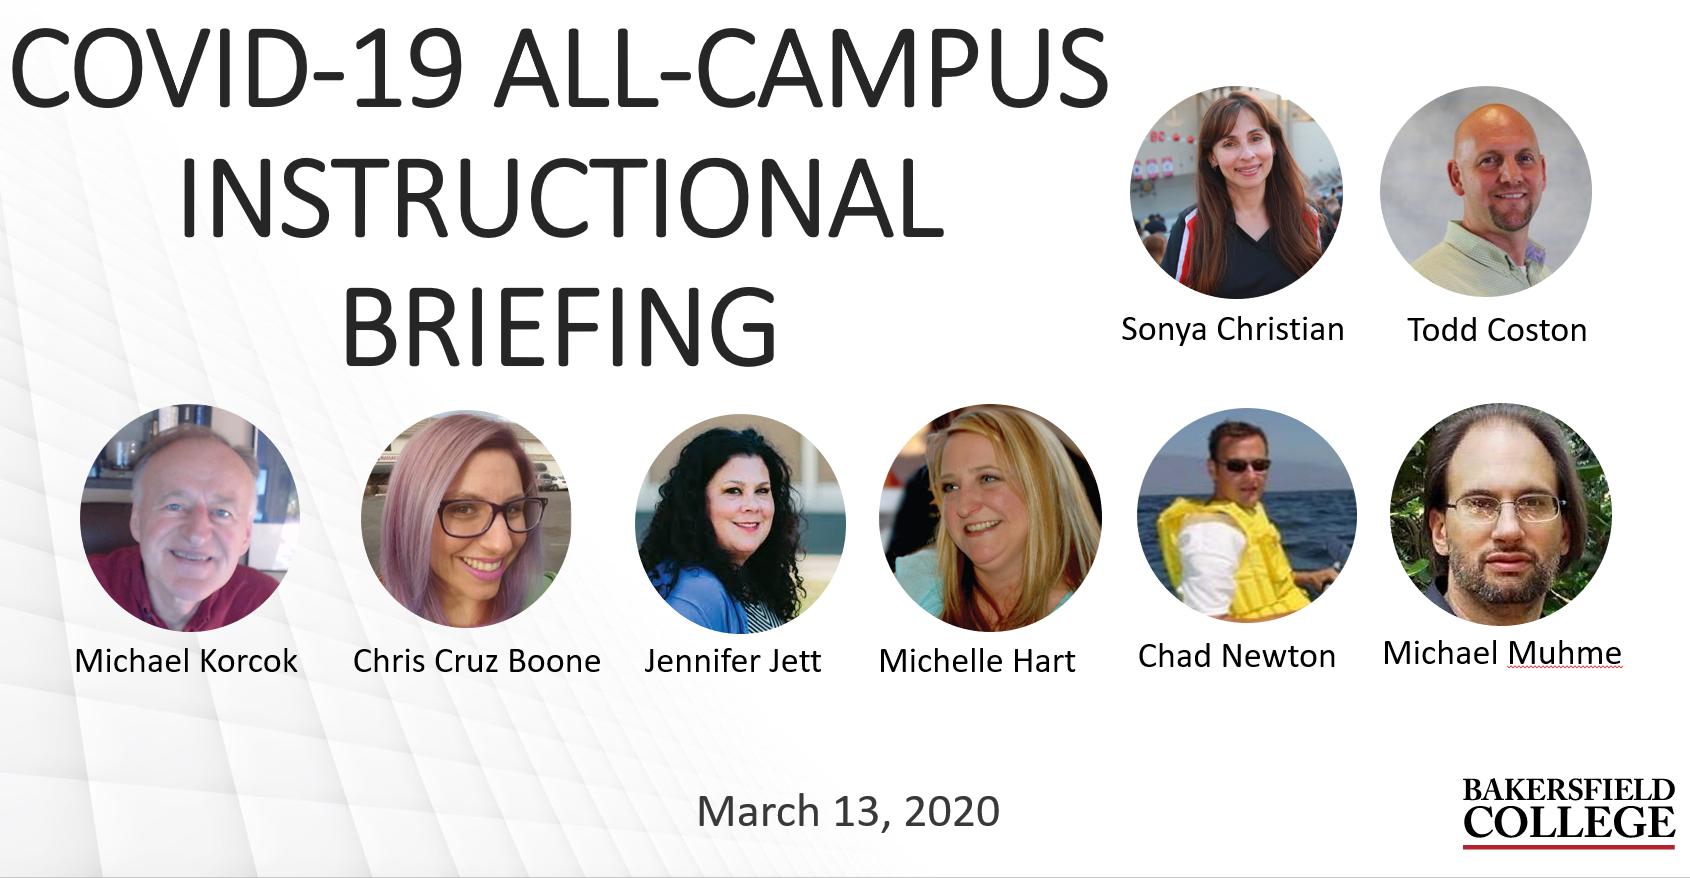 Image showing forum speakers including Sonya Christian, Todd Coston, Michael Korcok, Chris Cruz Boone, Jennifer Jett,  Michelle Hart, Chad Newton and Michael Muhme